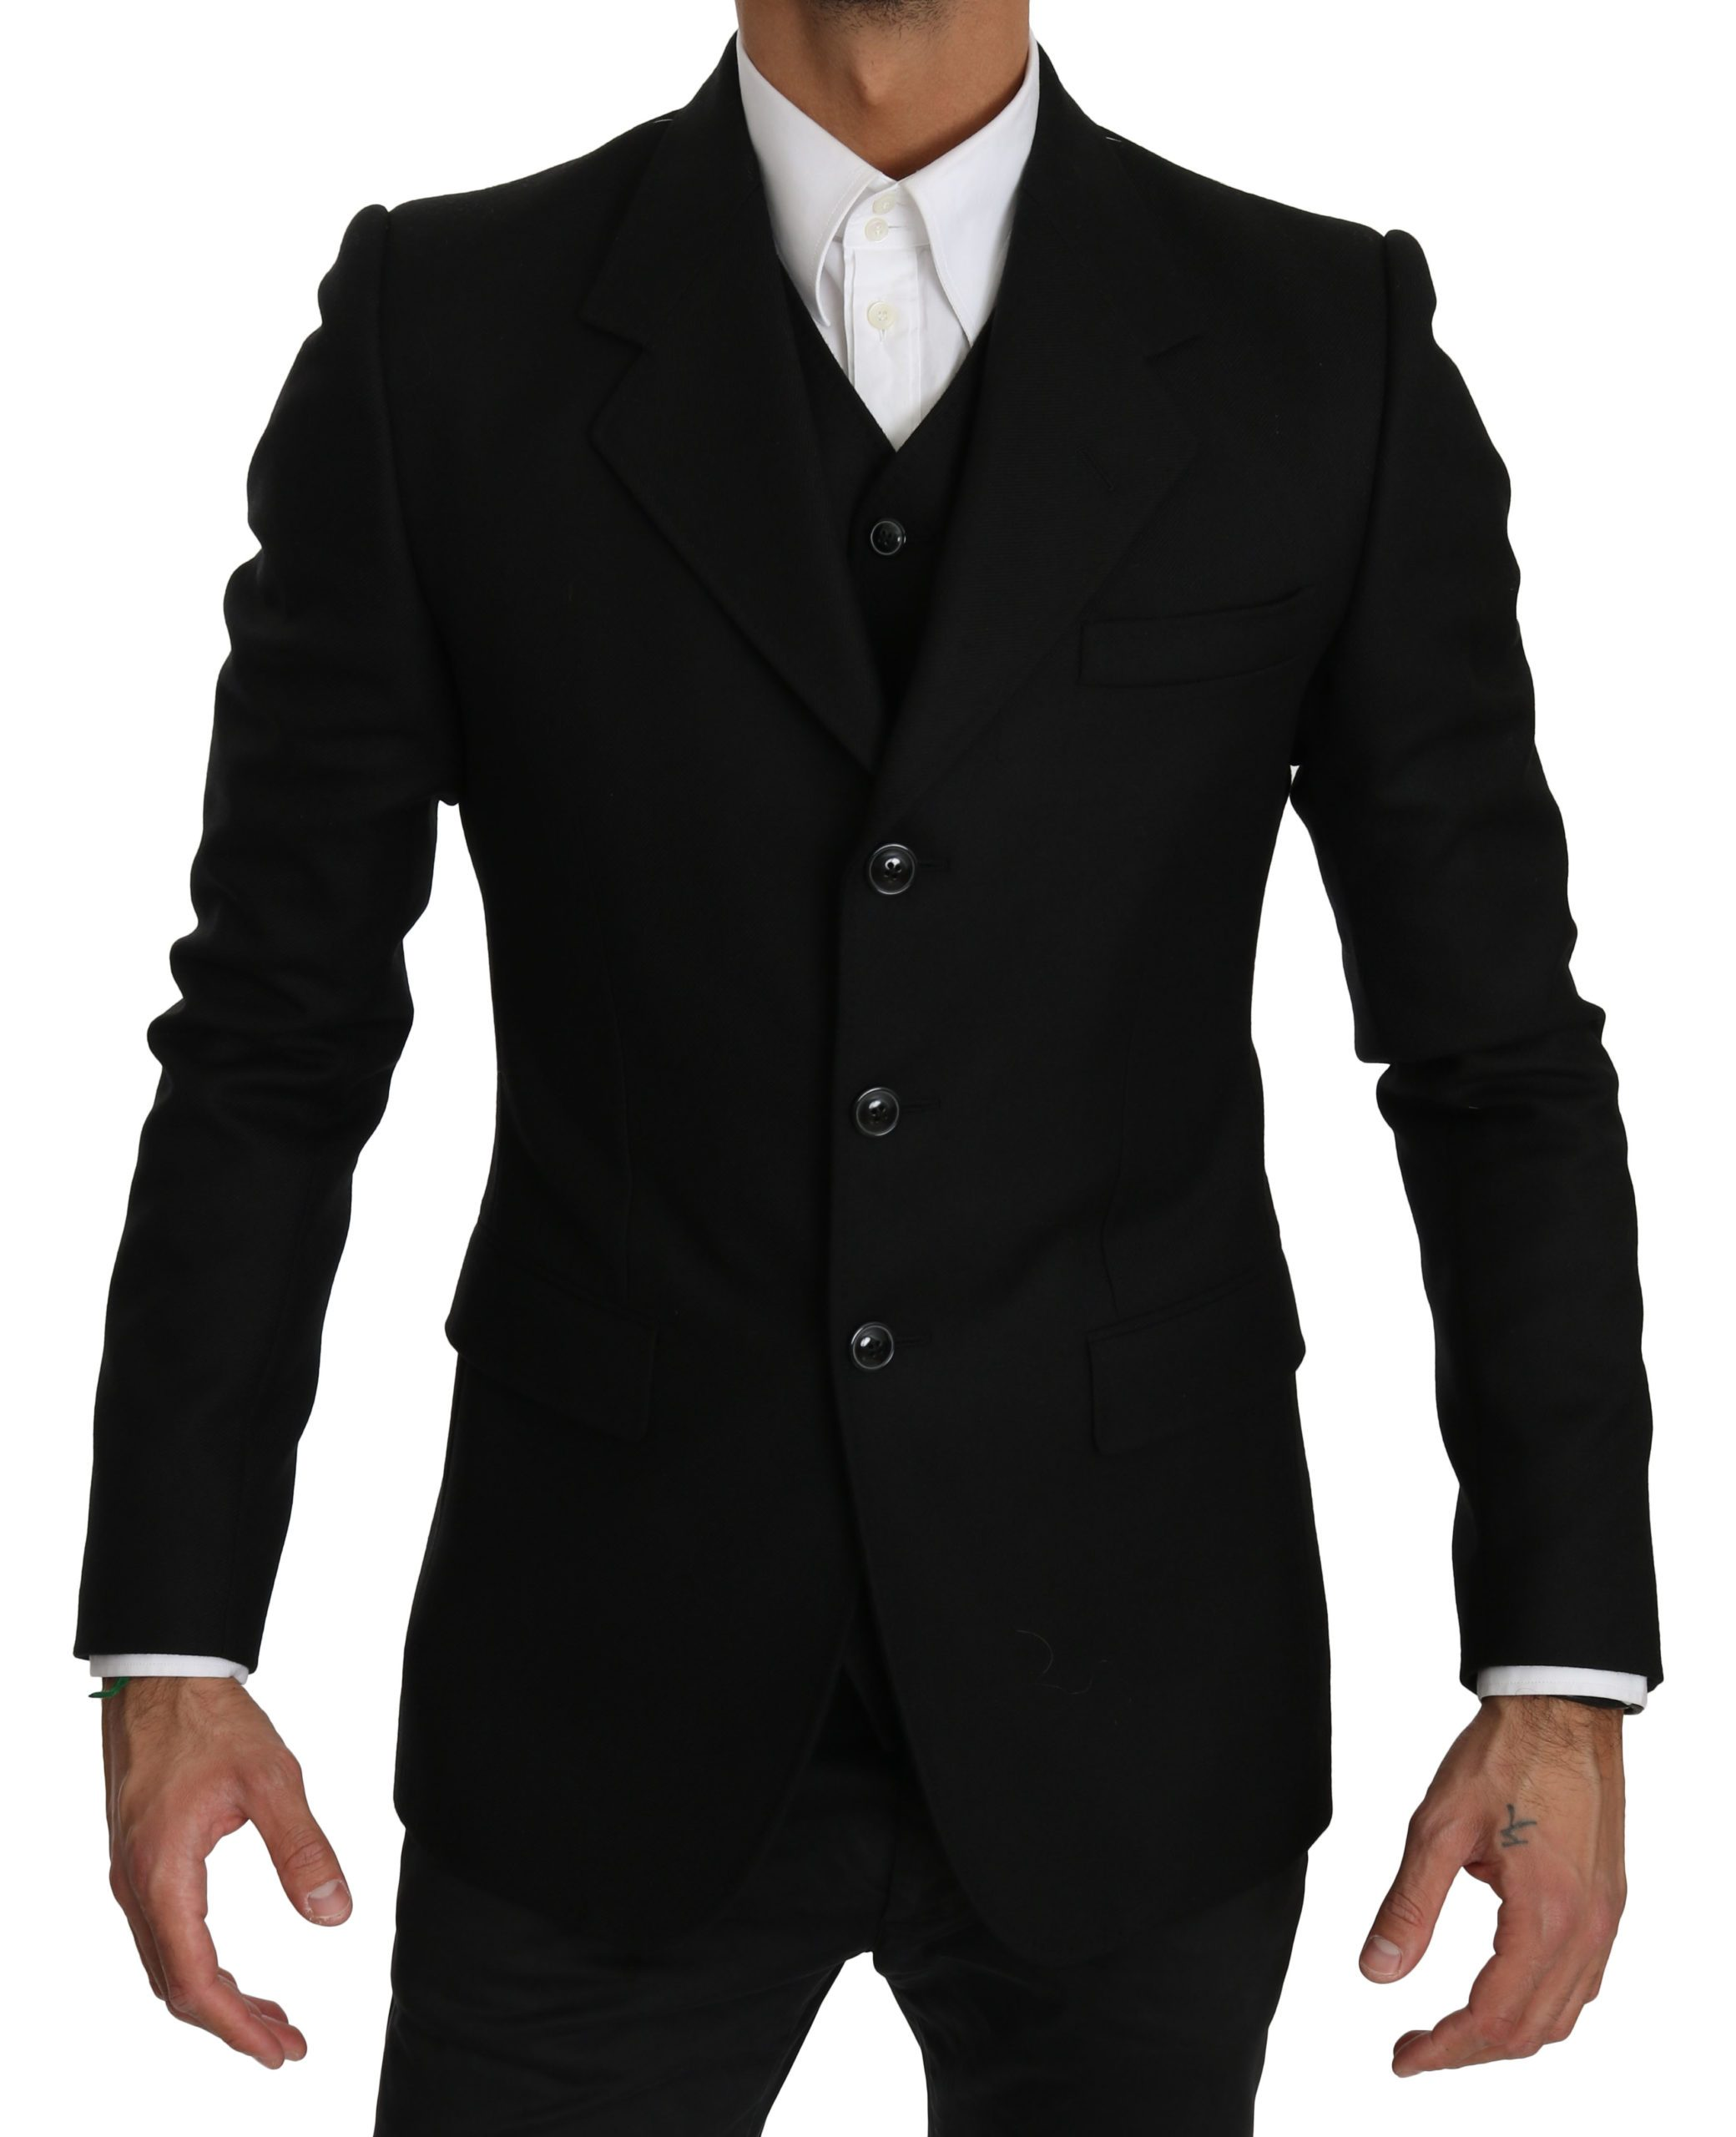 Dolce & Gabbana Men's Wool Two Piece Vest Jacket Blazer Black KOS1604 - IT48 | M